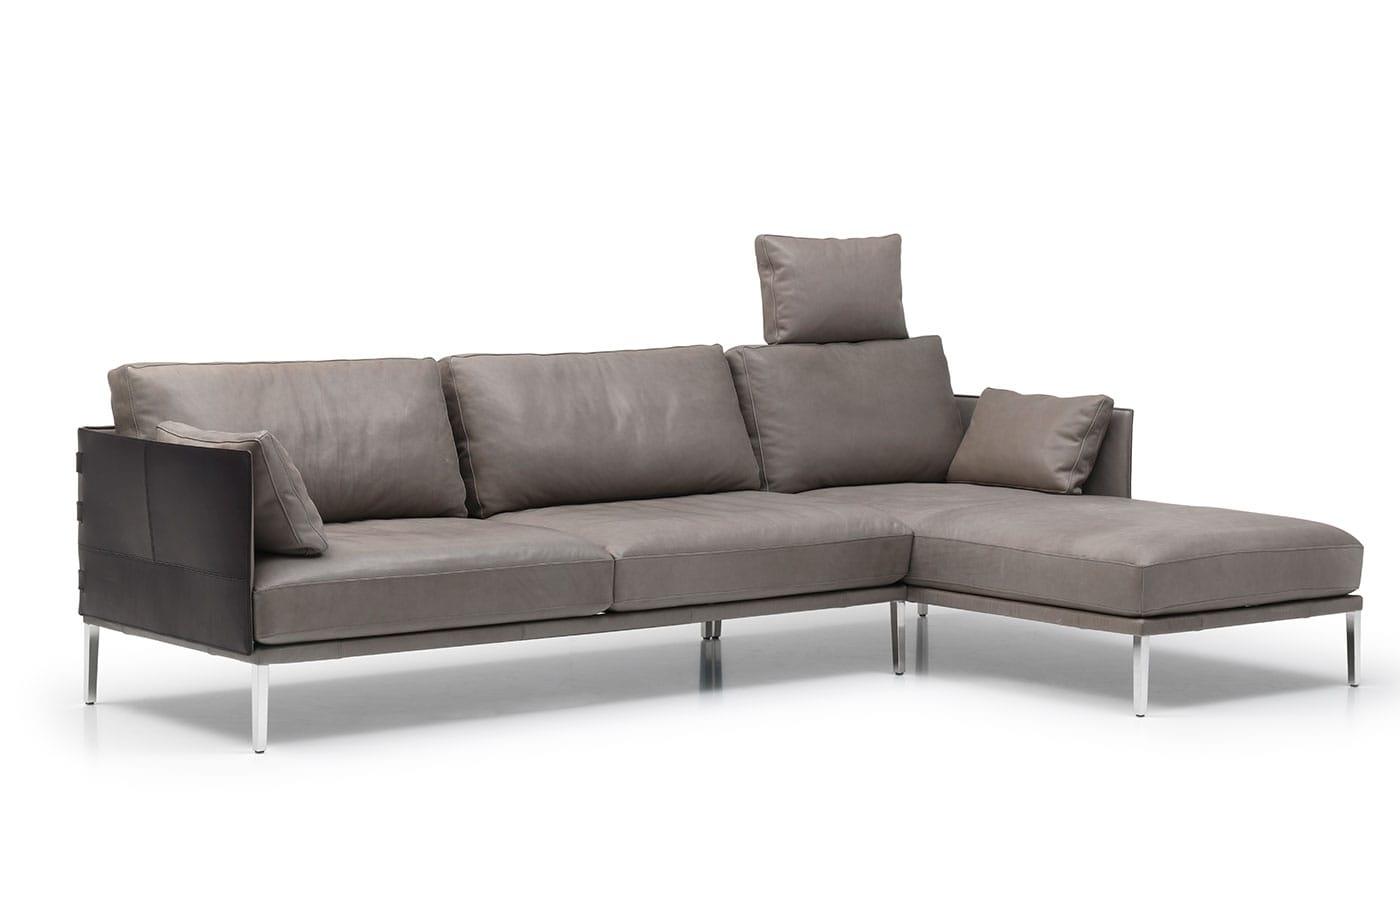 Full Size of De Sede Sofa Furniture Usa For Sale Bed Sessel Gebraucht Kaufen Outlet Used Couch Preise Endless Ds 600 Bi Uk Leder Tom Tailor Wanddeko Küche Megapol Sofa De Sede Sofa